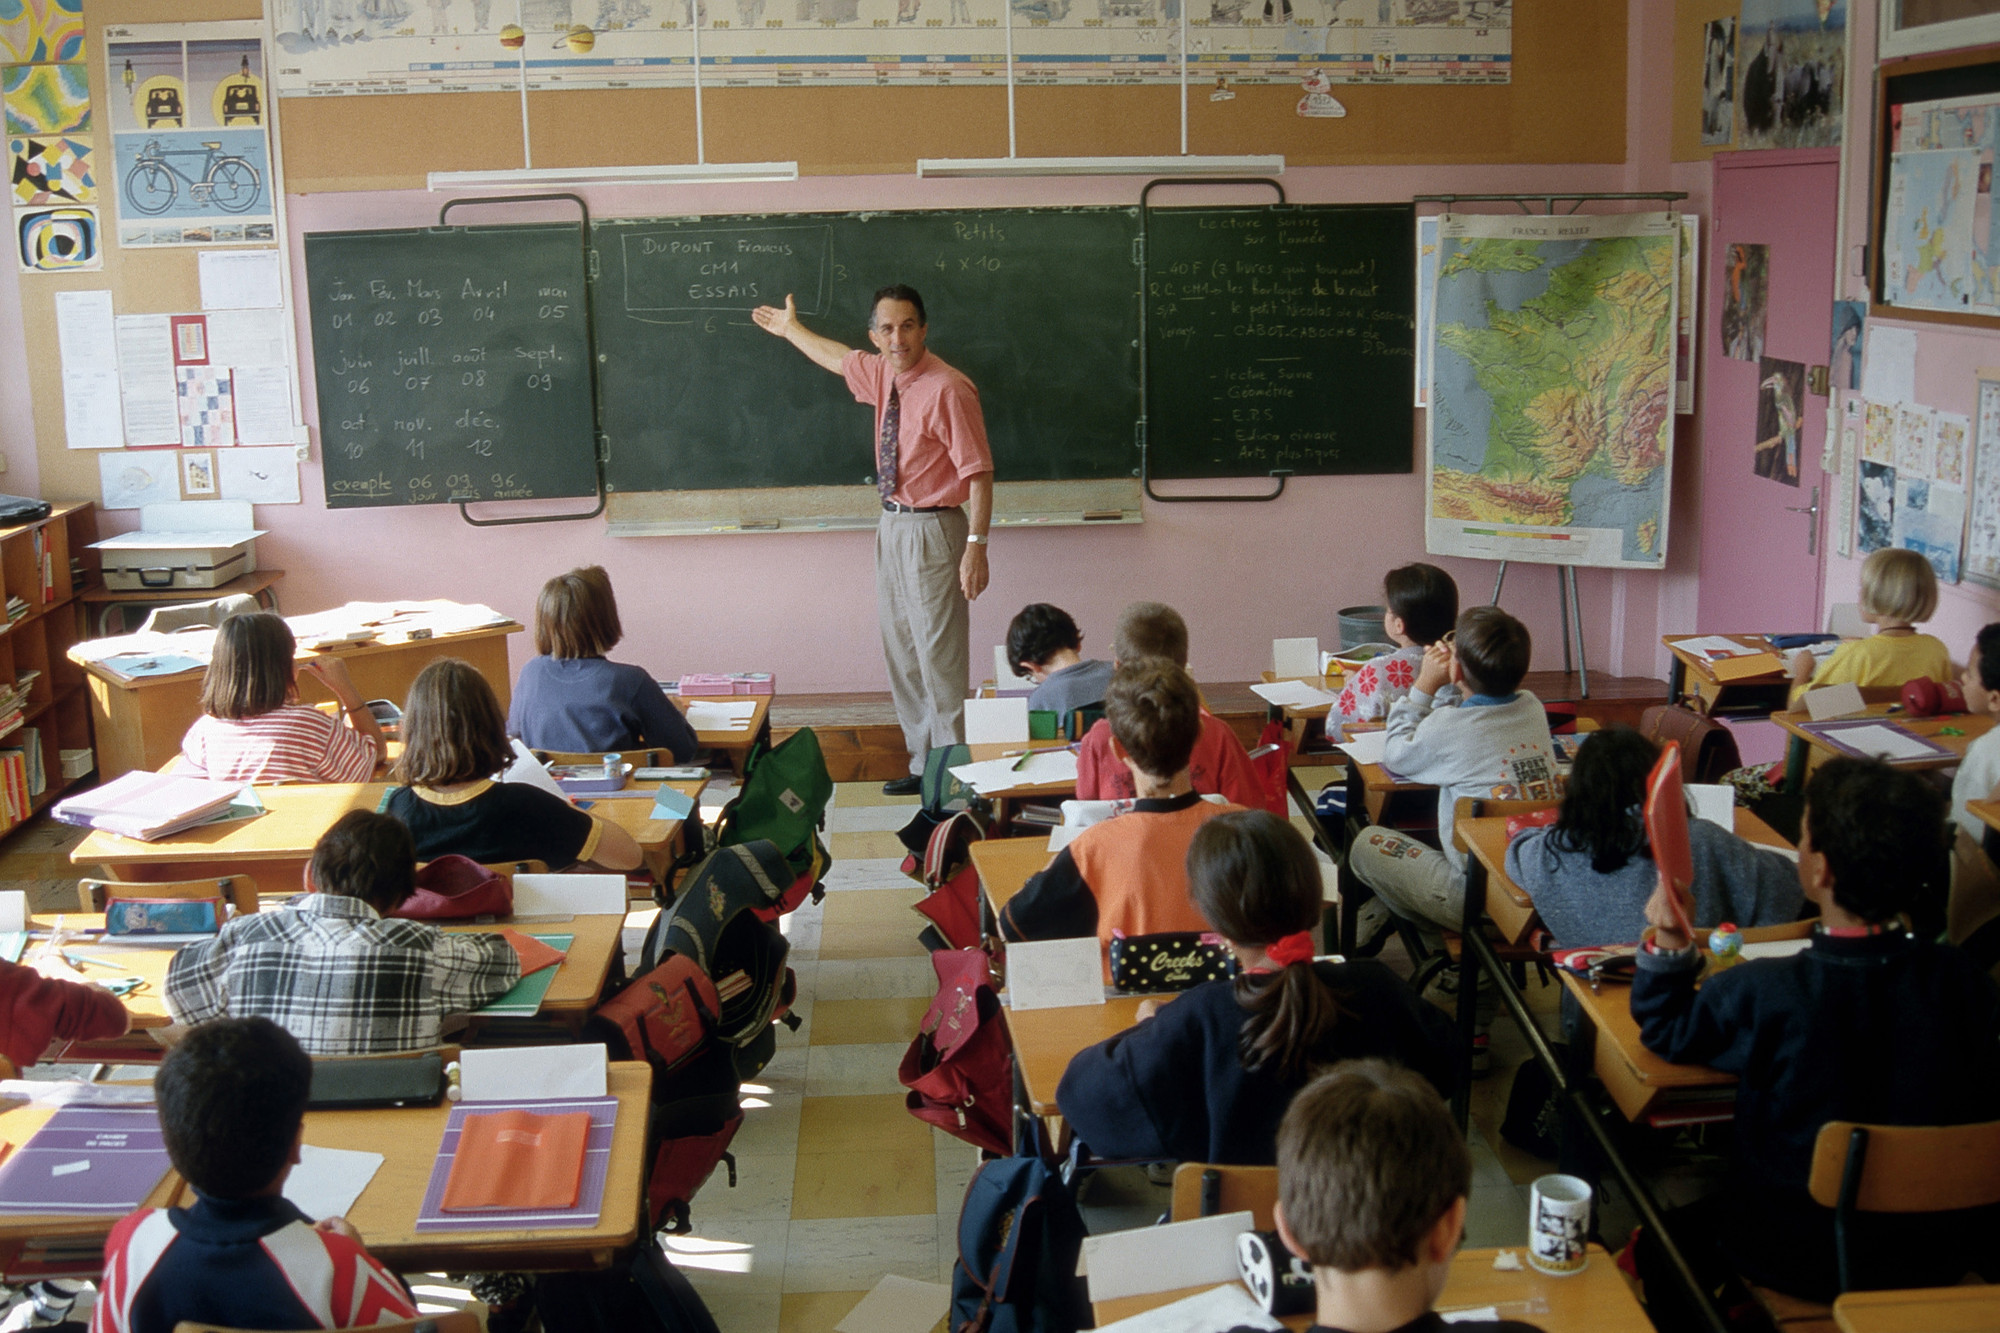 Teacher Tenure Laws in State Unconstitutional, Judge Rules